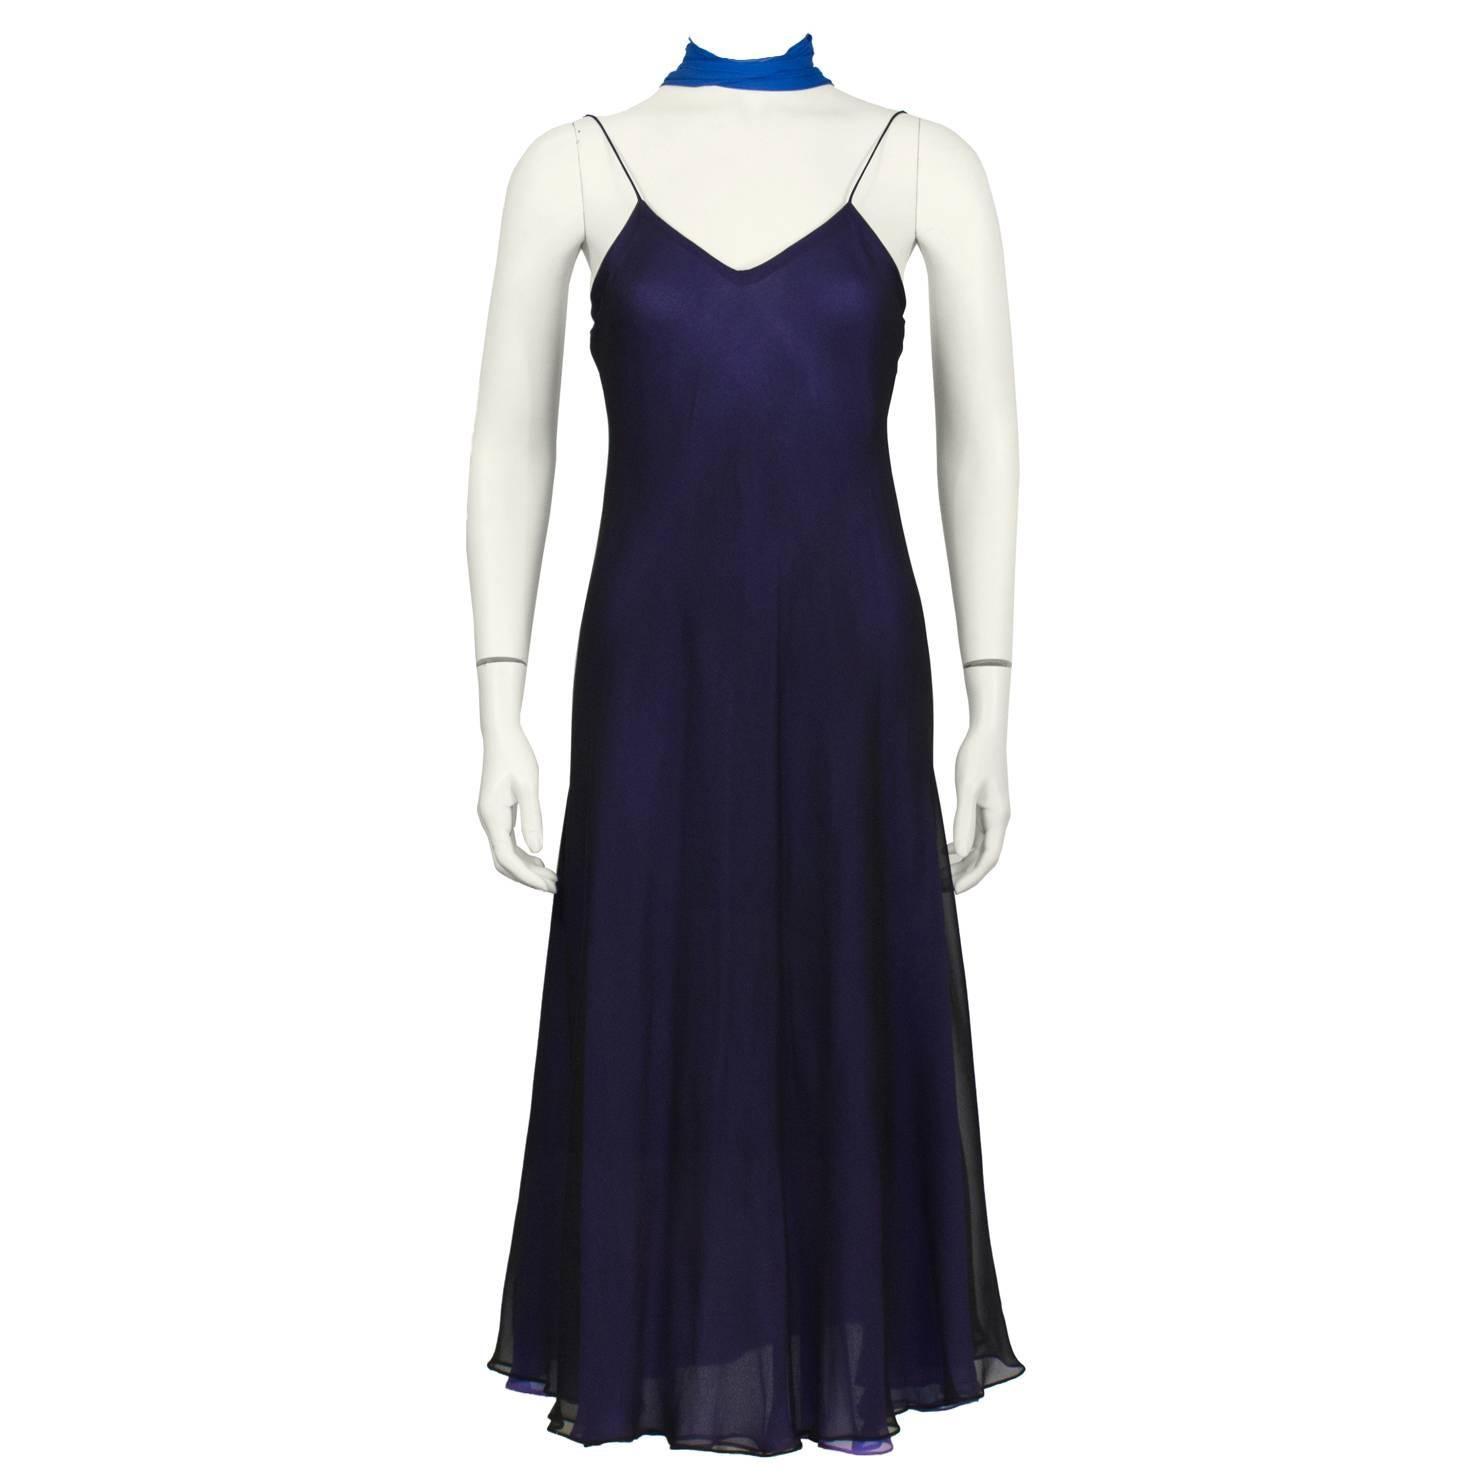 1970's George Stavropoulos Navy Slip Dress